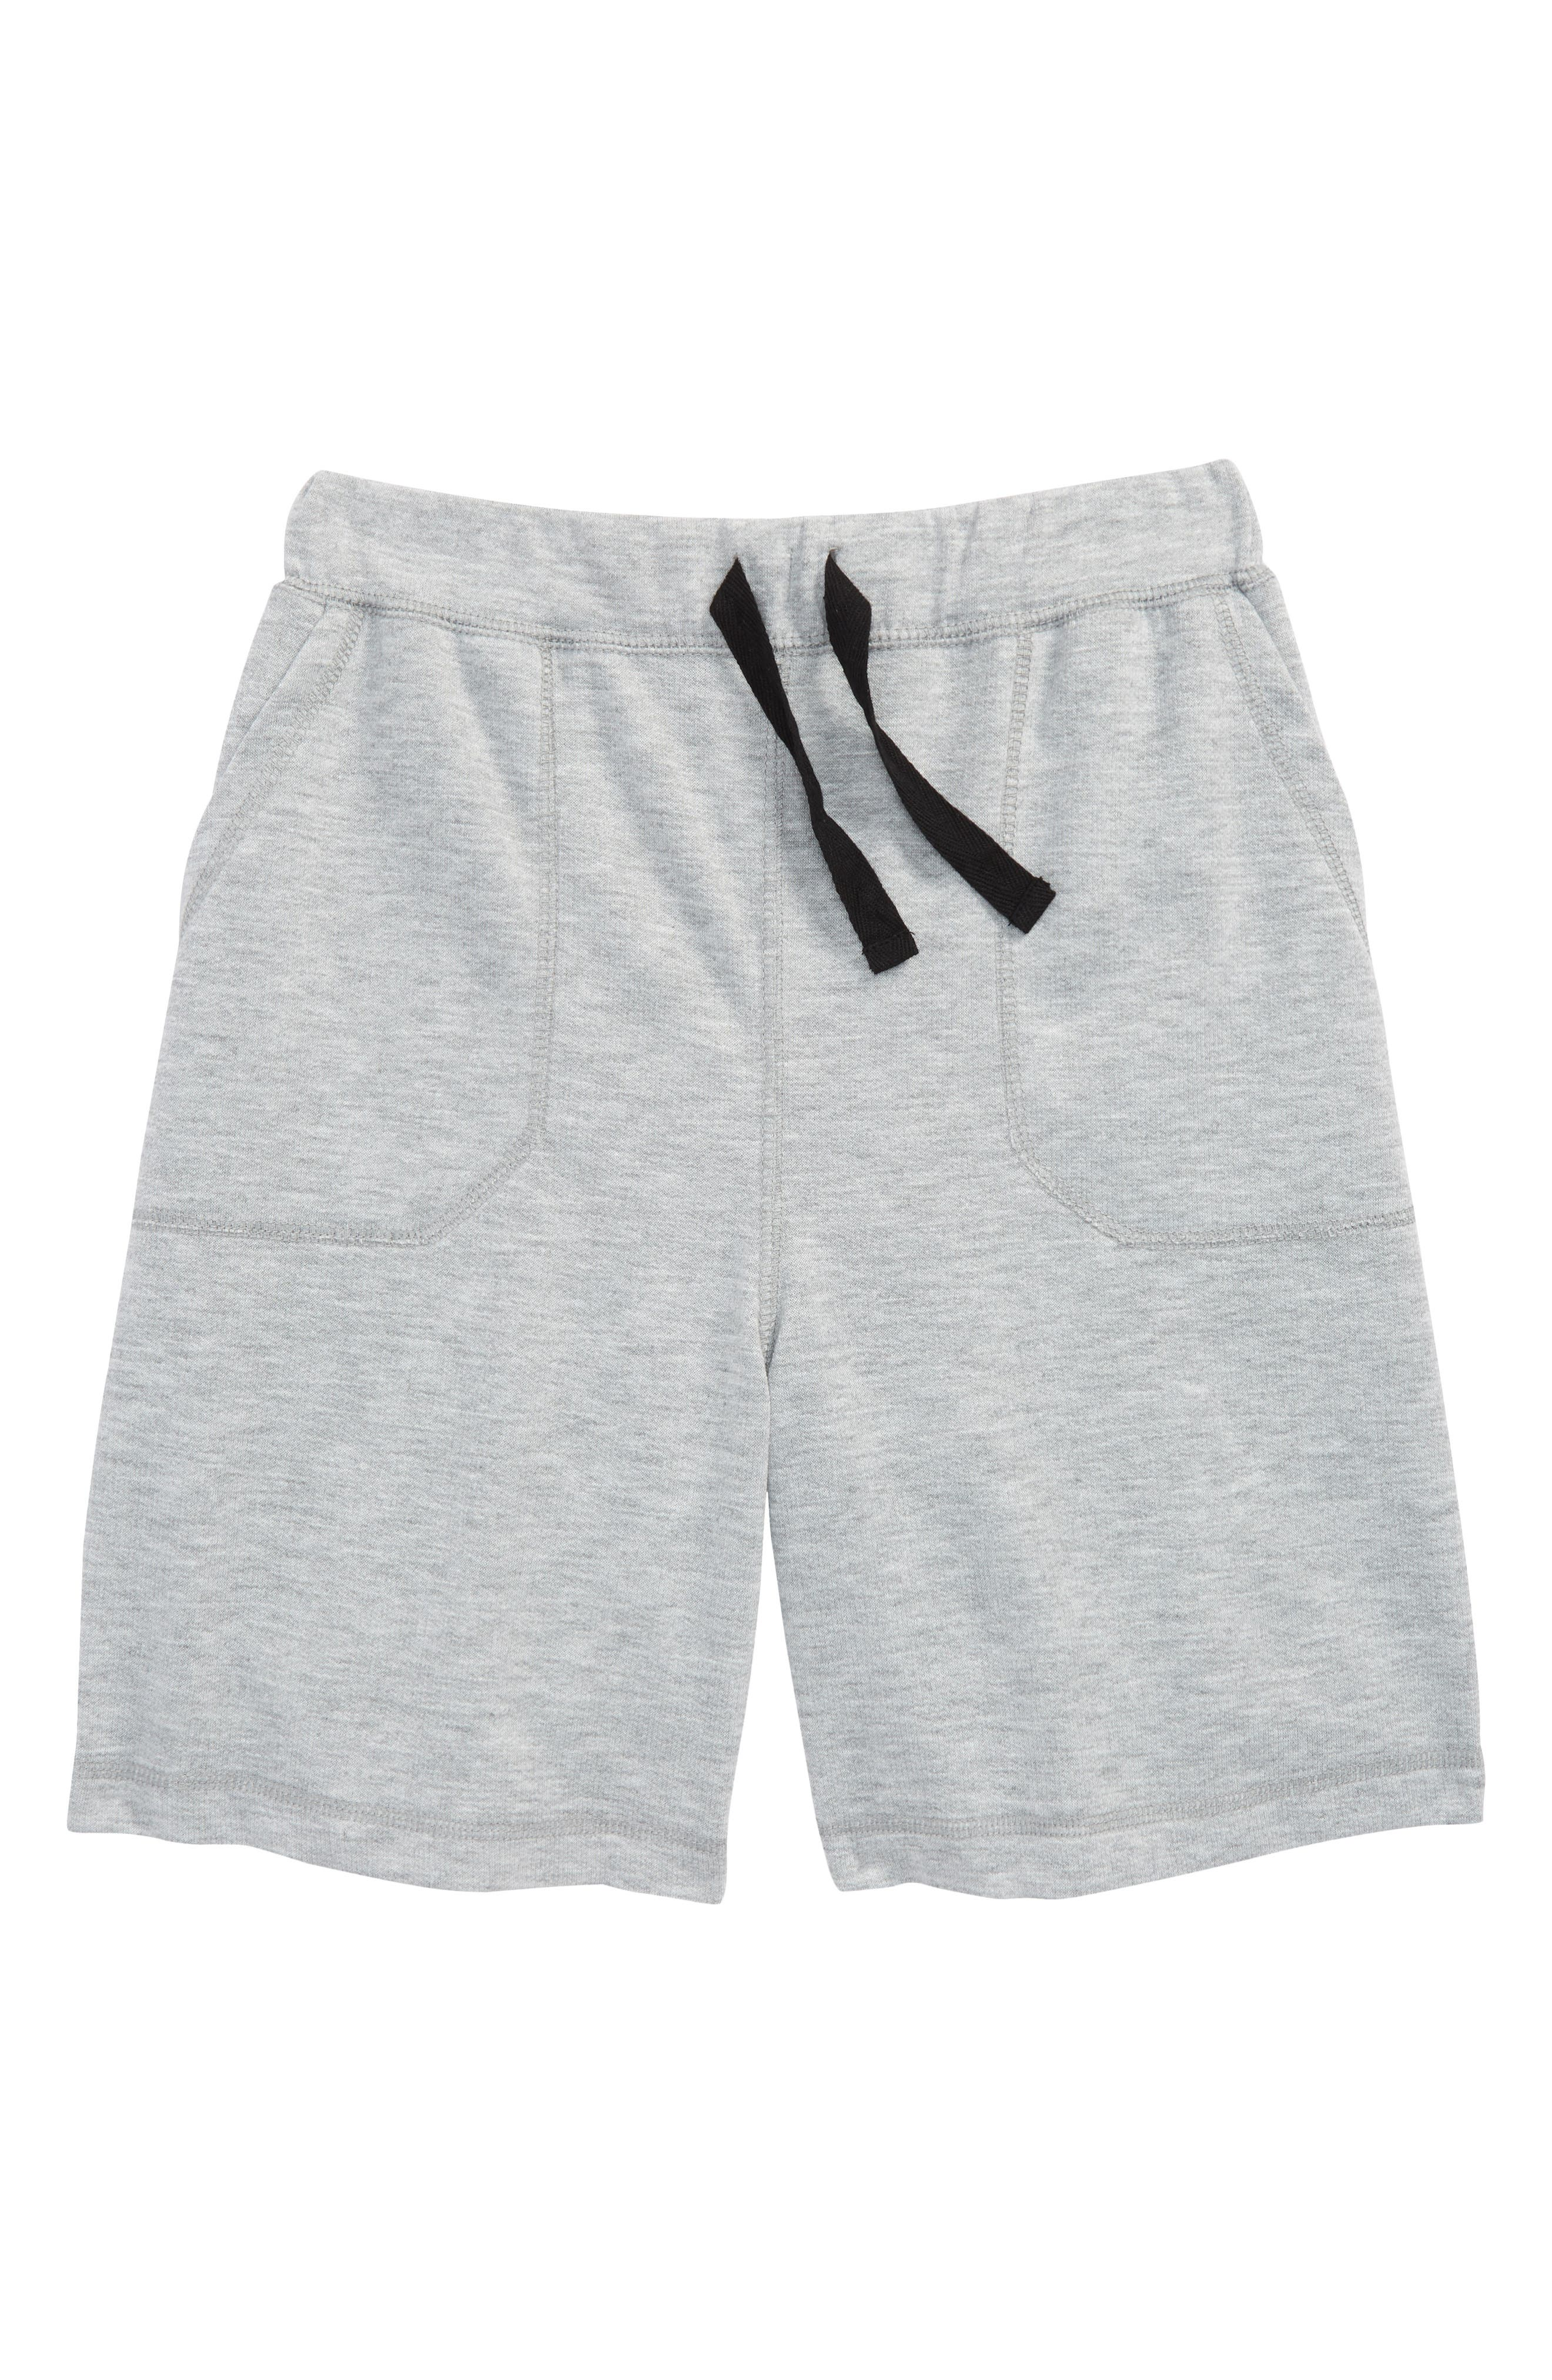 Main Image - Tucker + Tate Soft Sleep Shorts (Big Boys)